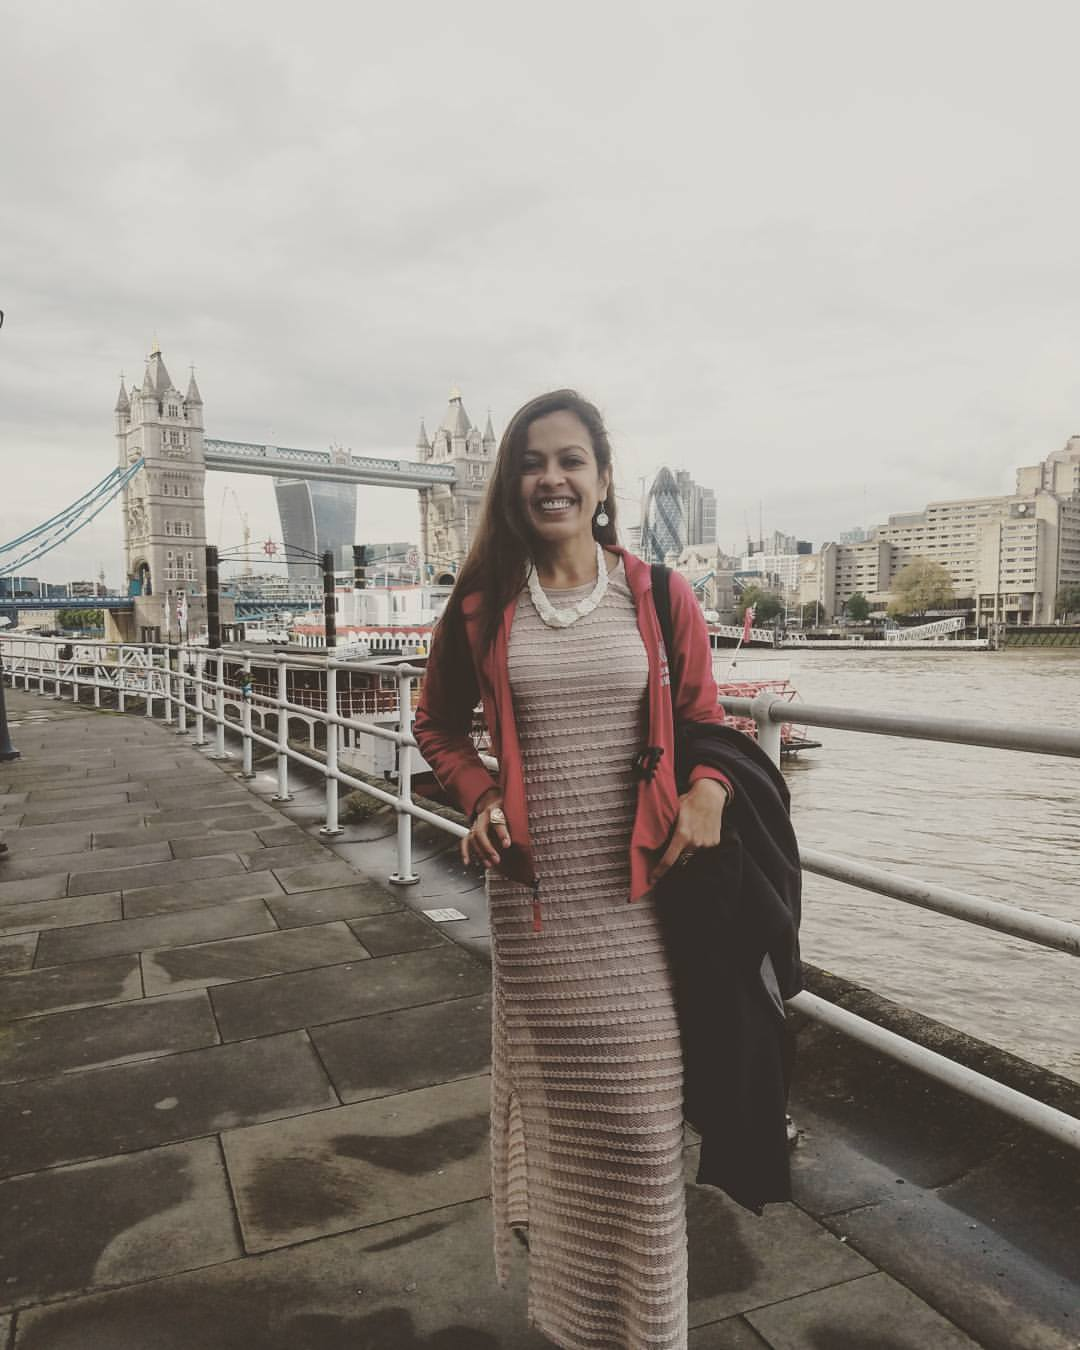 London. Sept. 2017 -